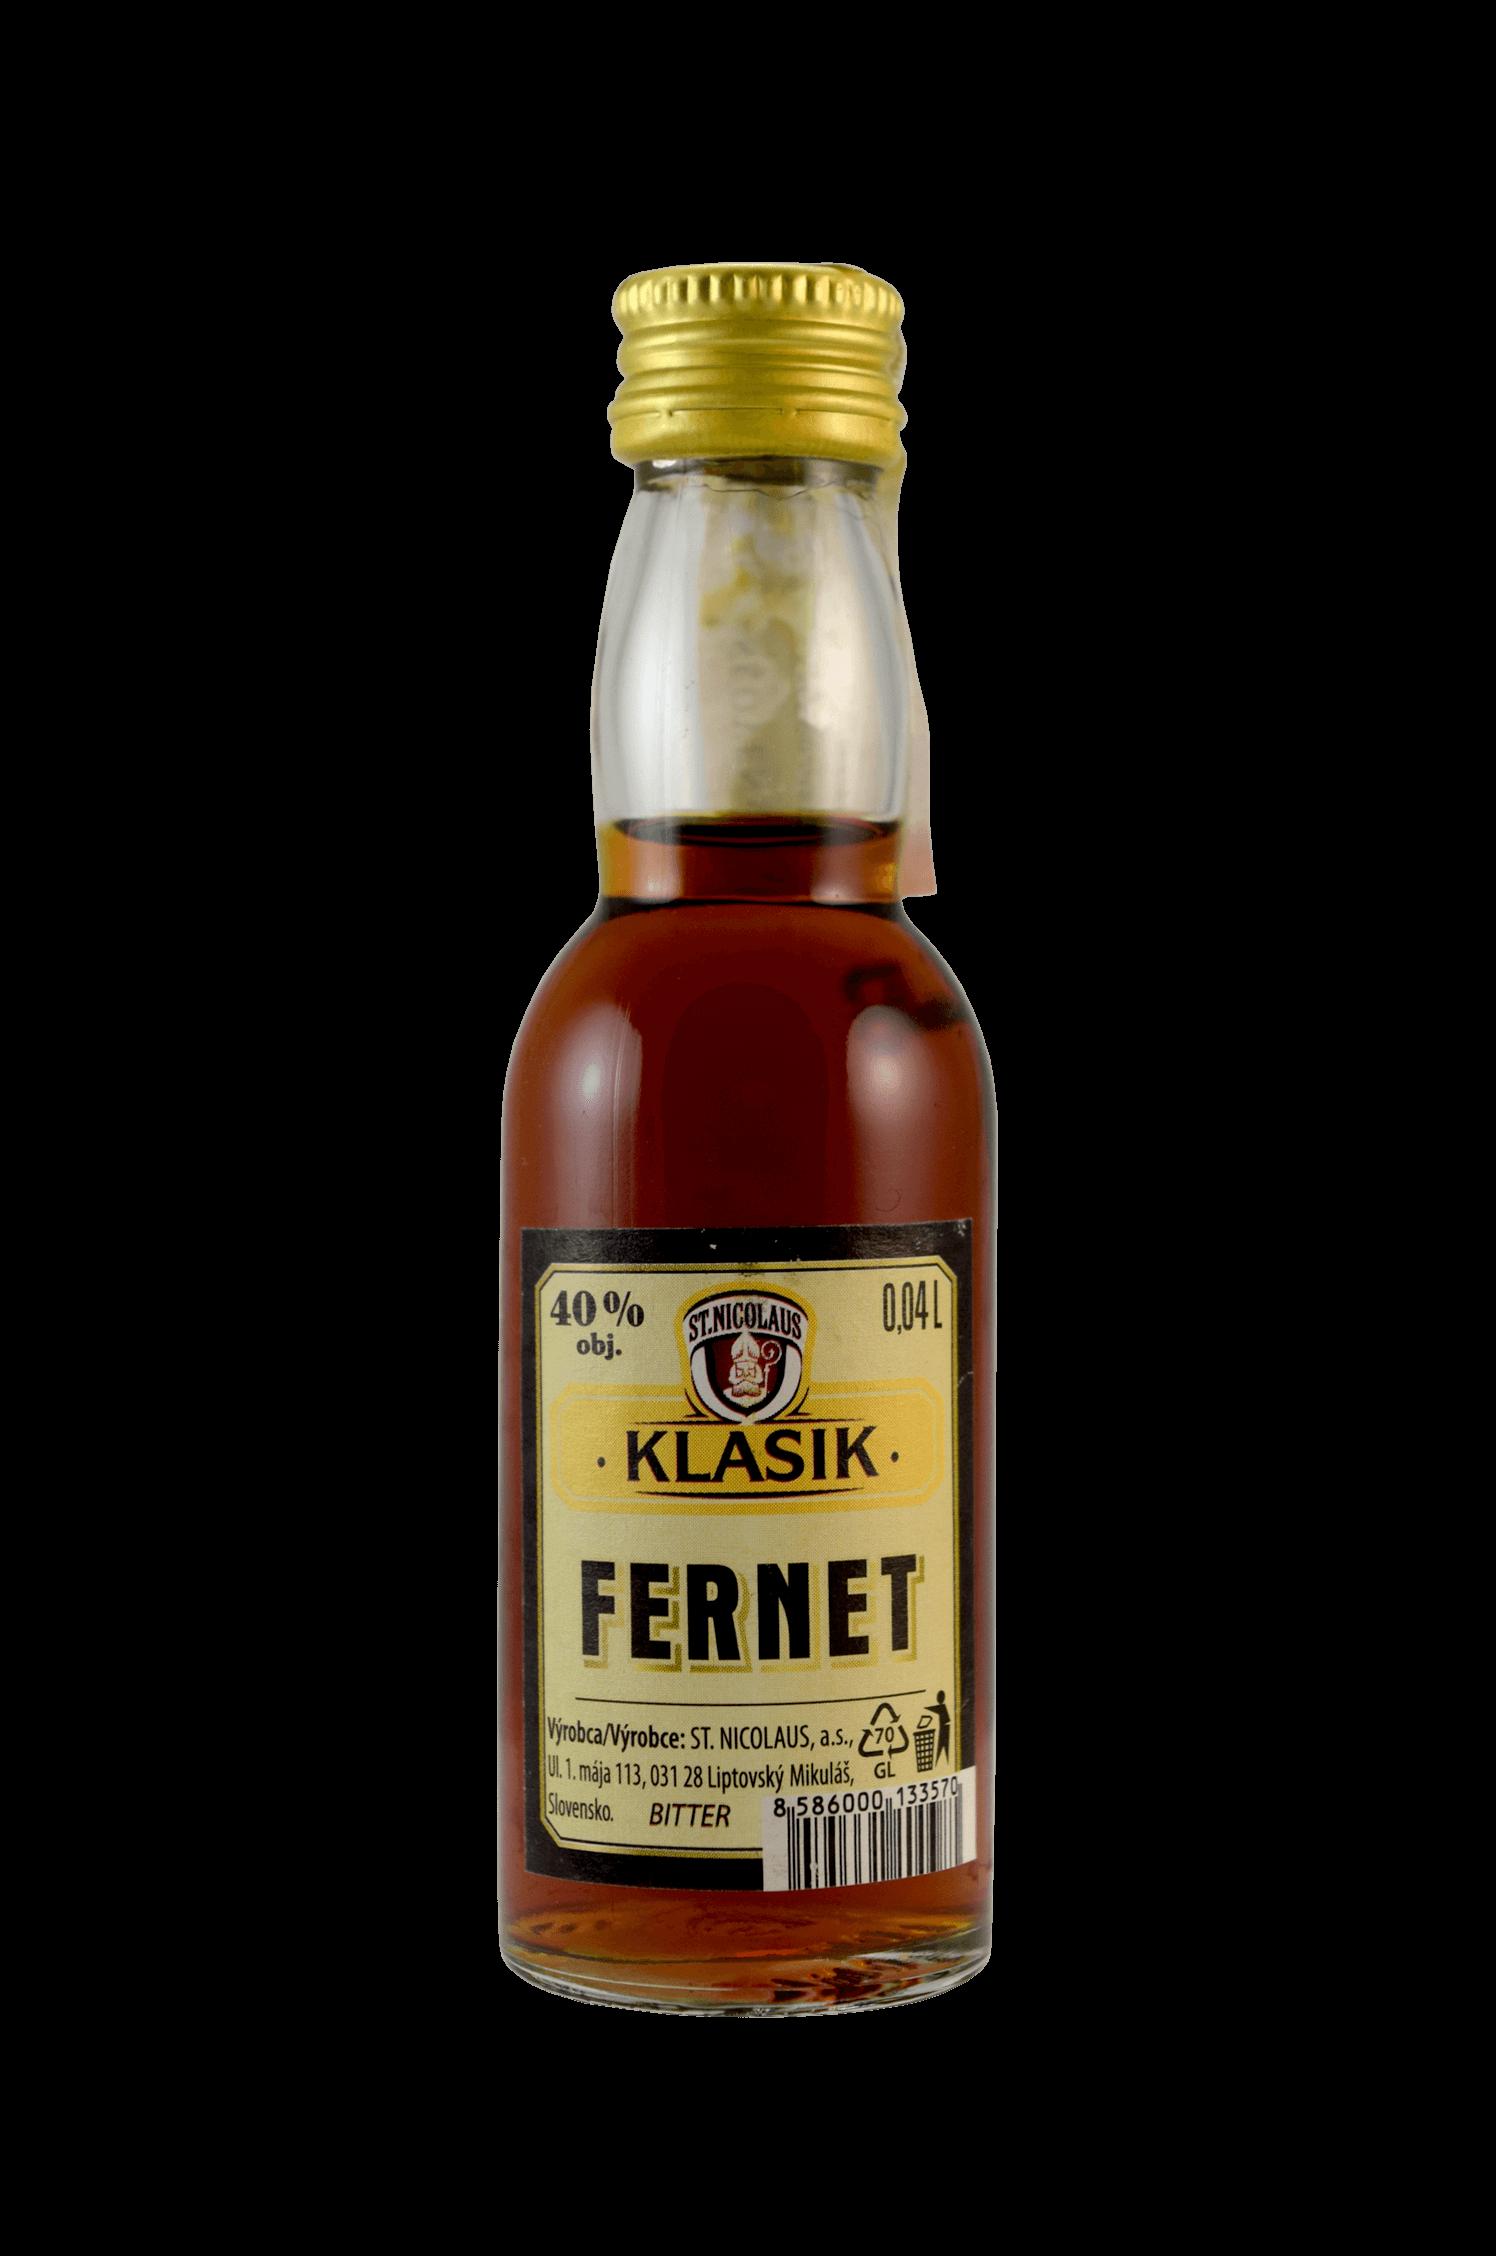 Fernet Klasik